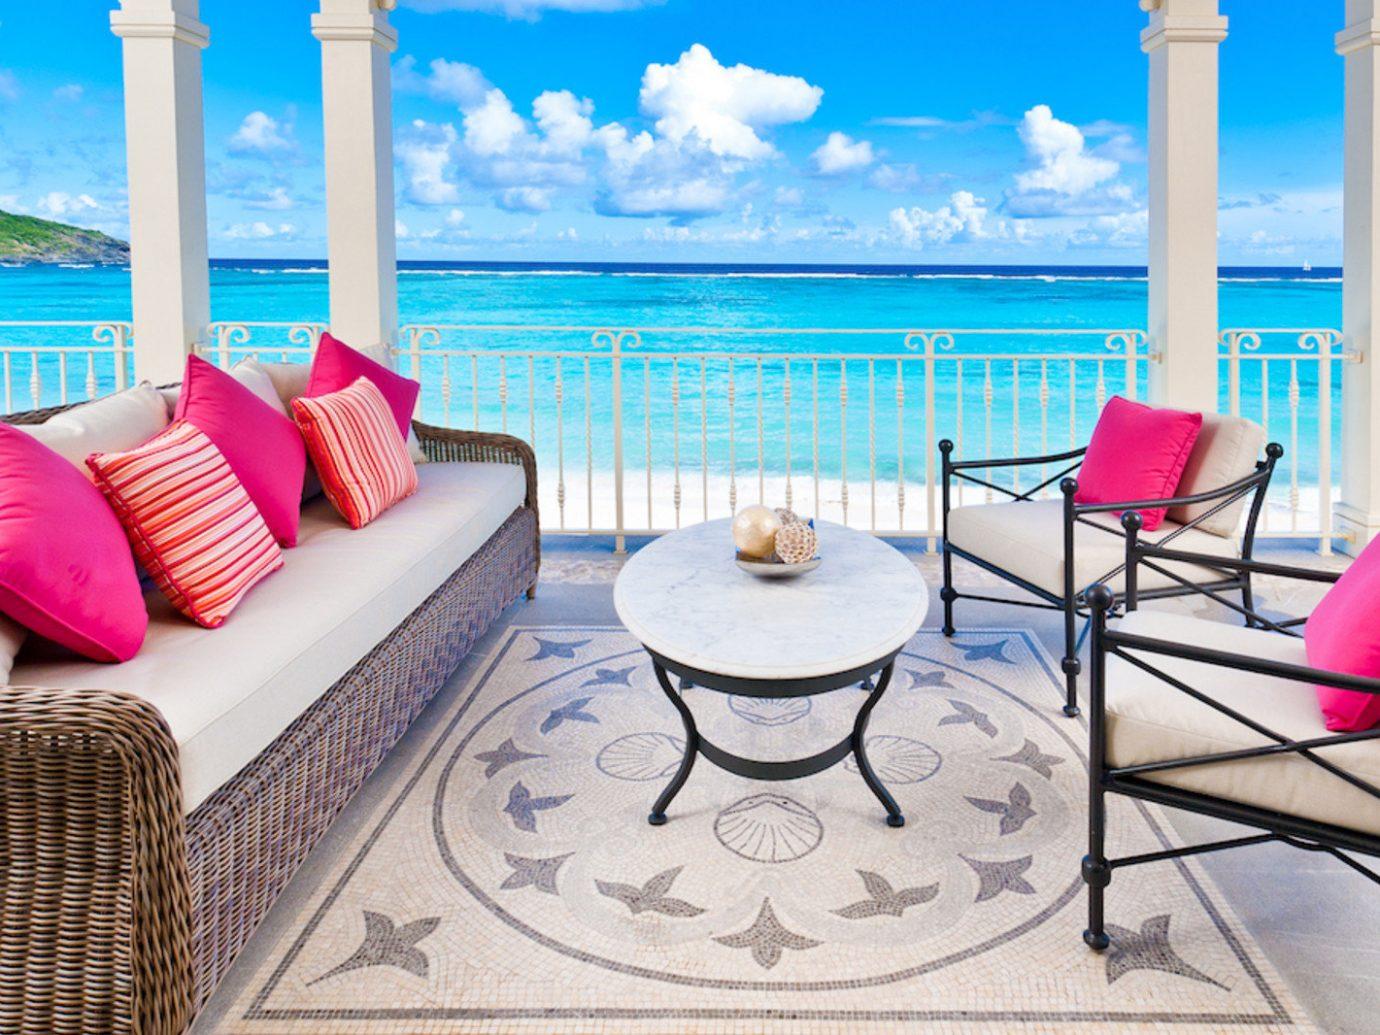 Cabana at Mandarin Oriental, Canouan, Caribbean